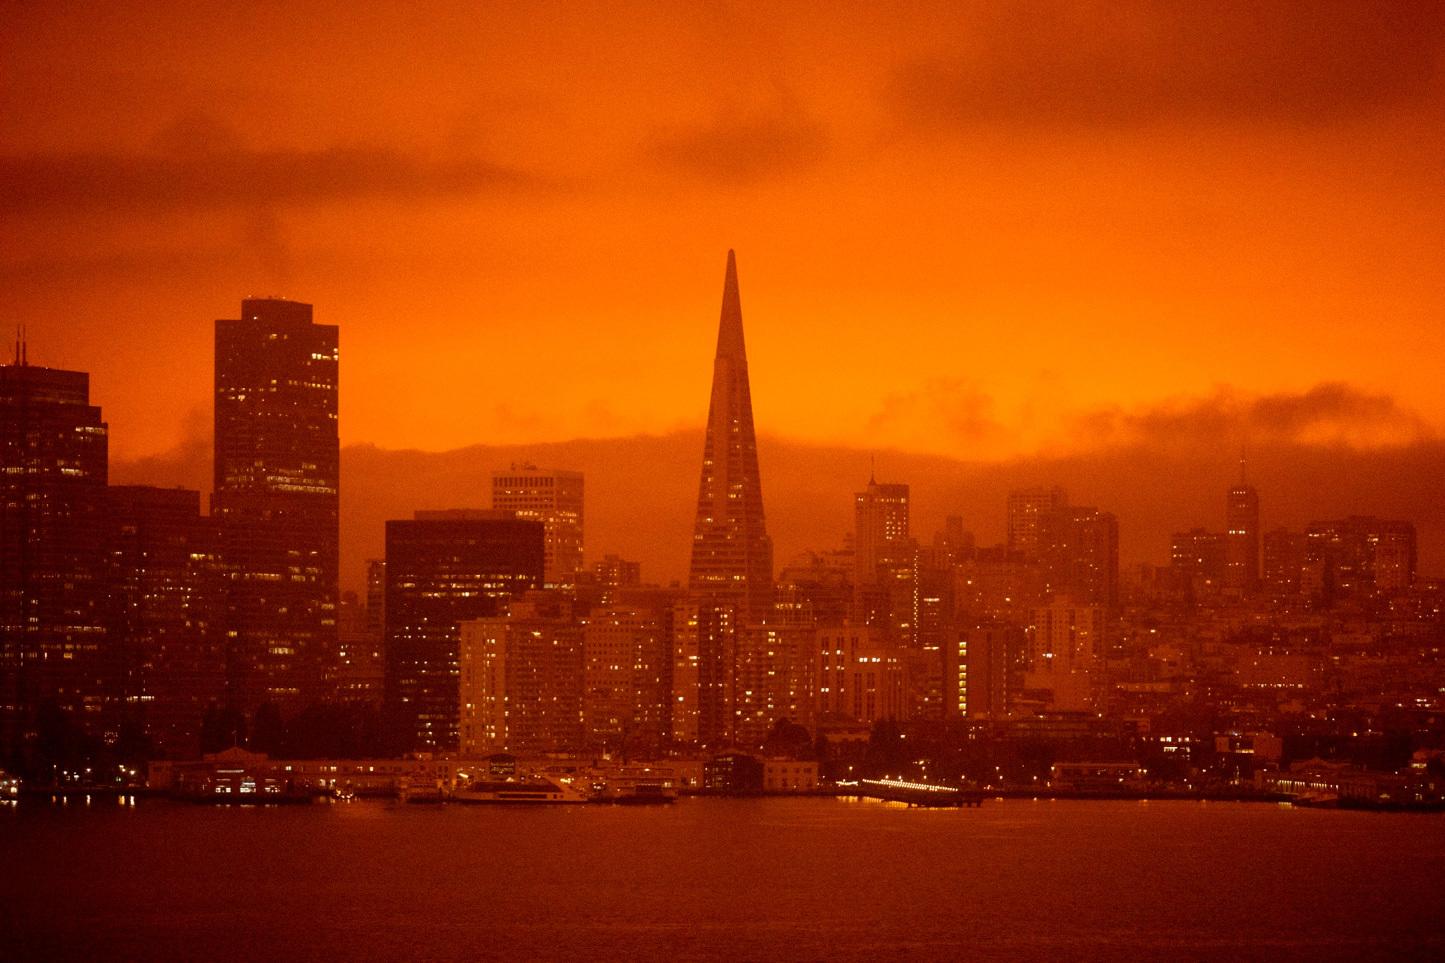 Orange San Francisco